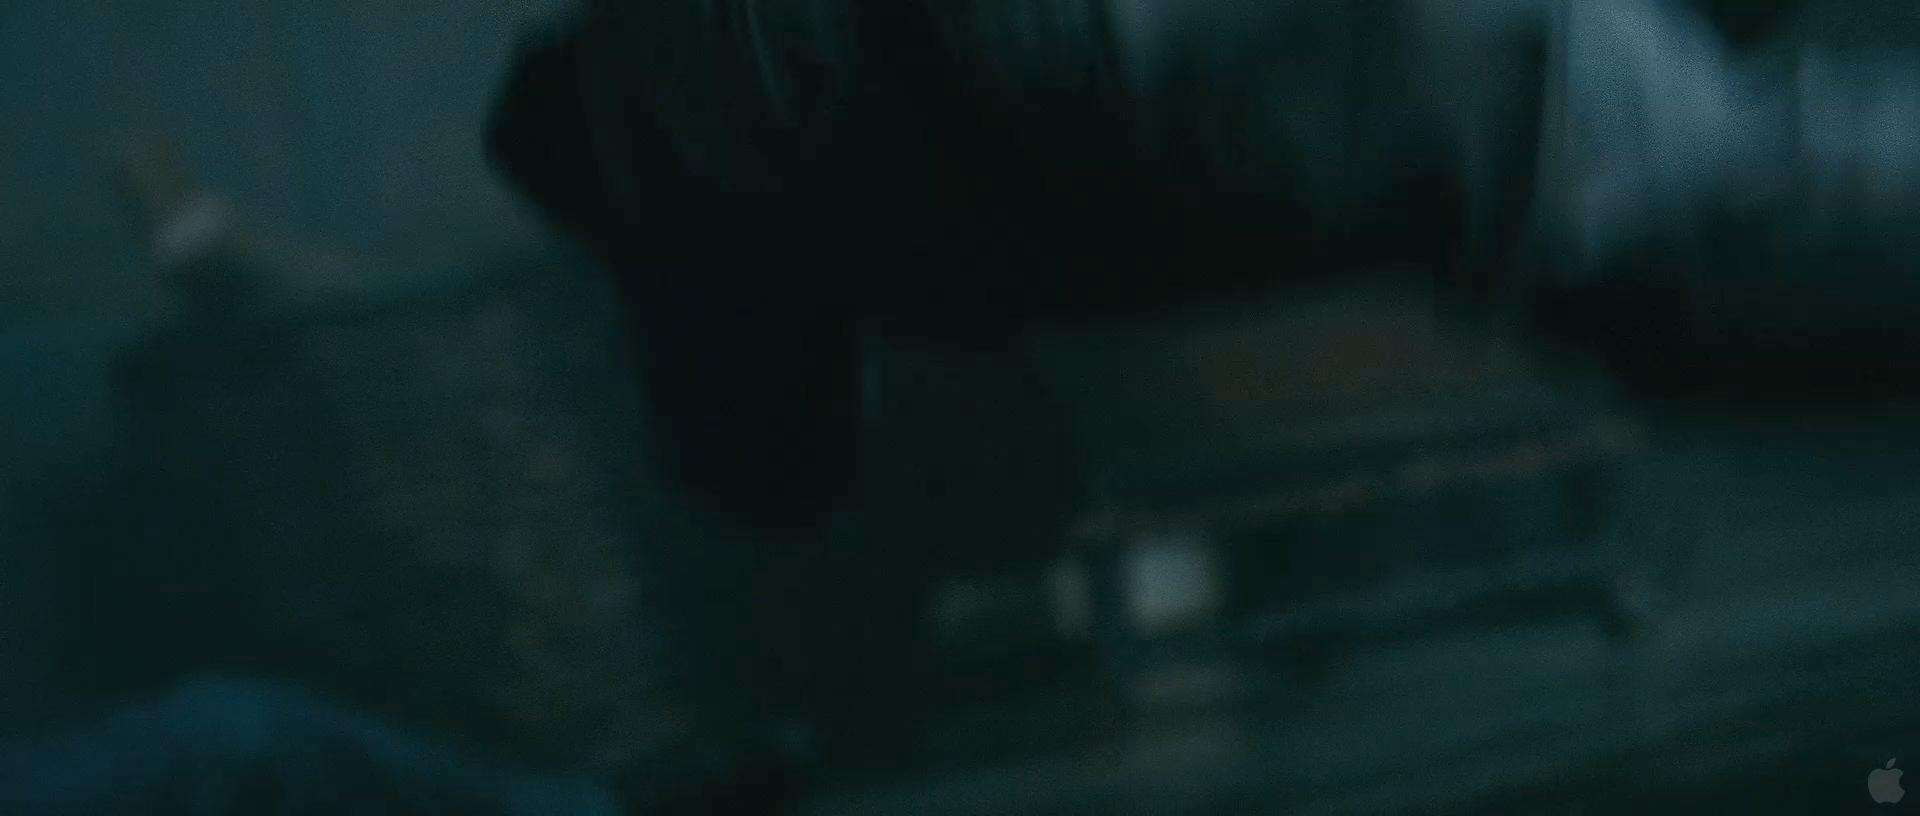 Harry Potter BlogHogwarts HP7 2 Trailer 15